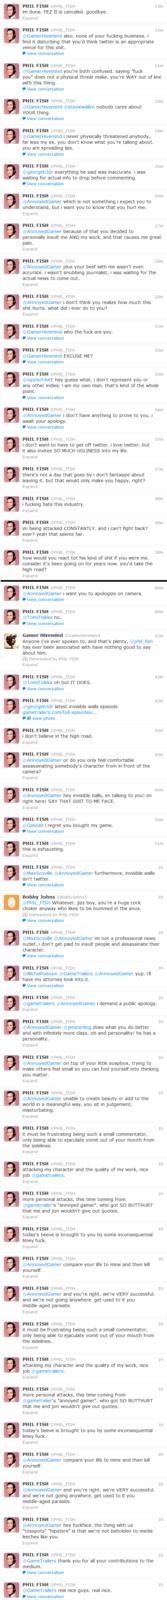 Phil Fish Tweets